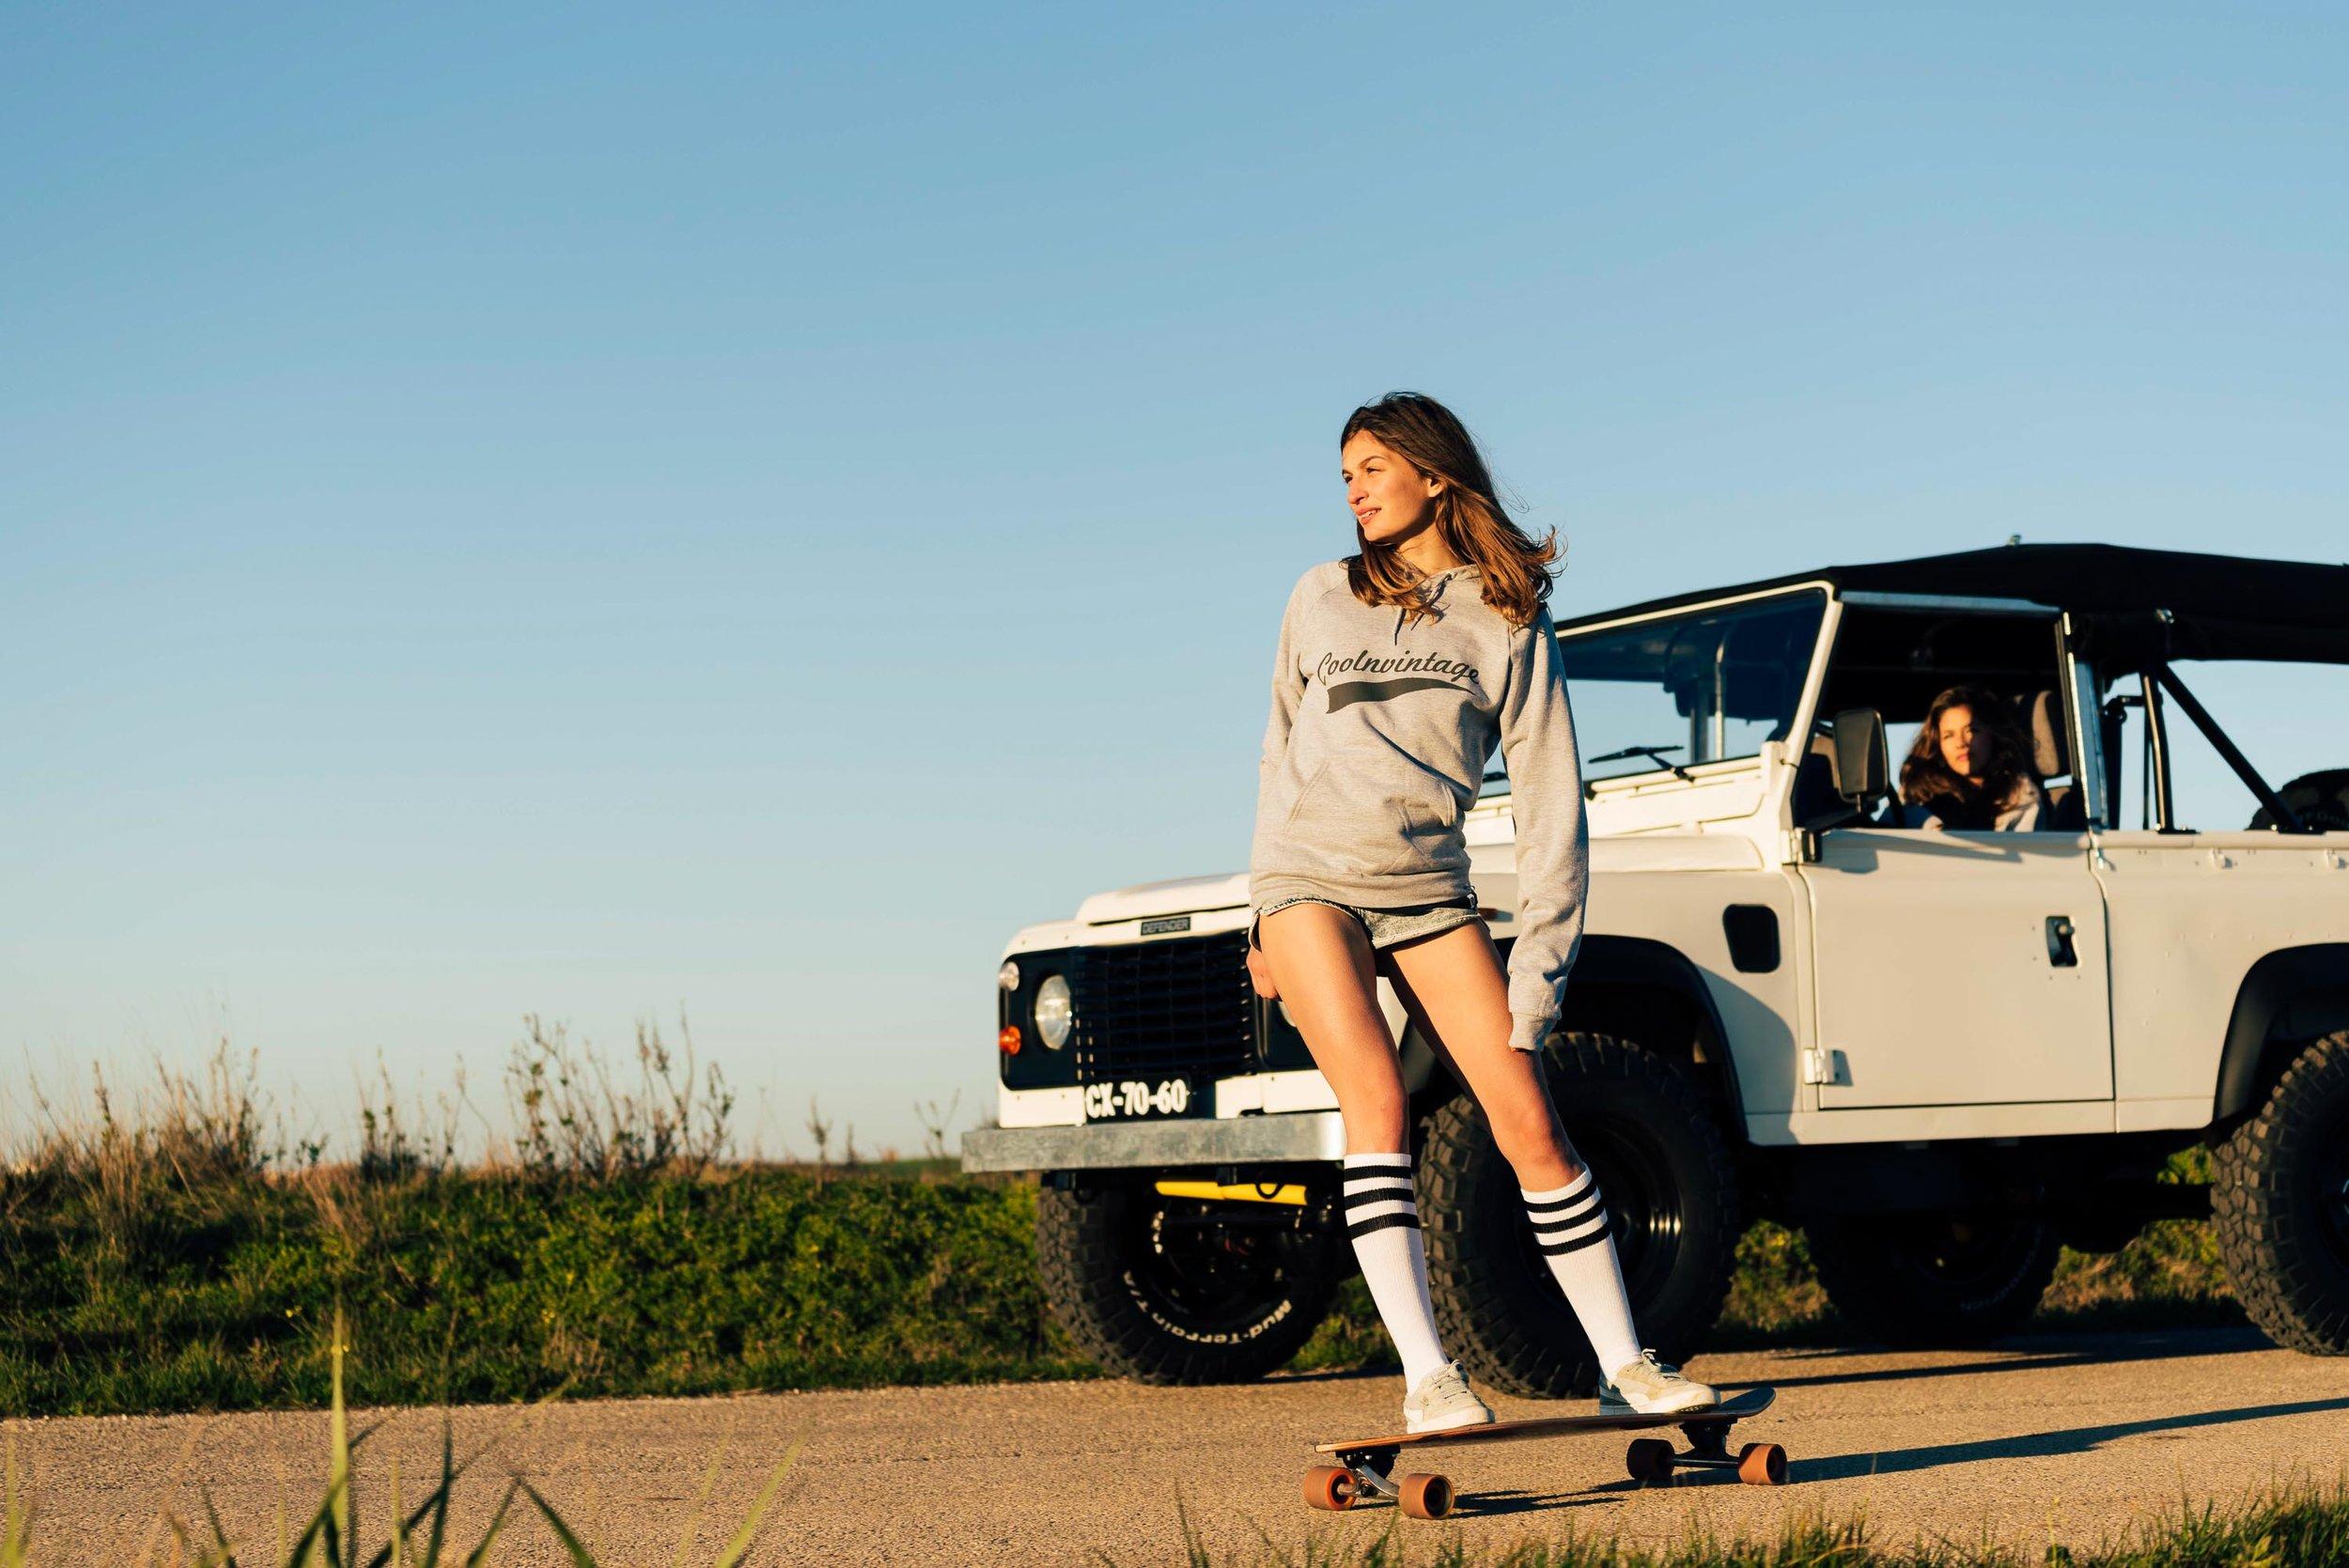 Coolnvntage Land Rover D90 (20_21).jpg